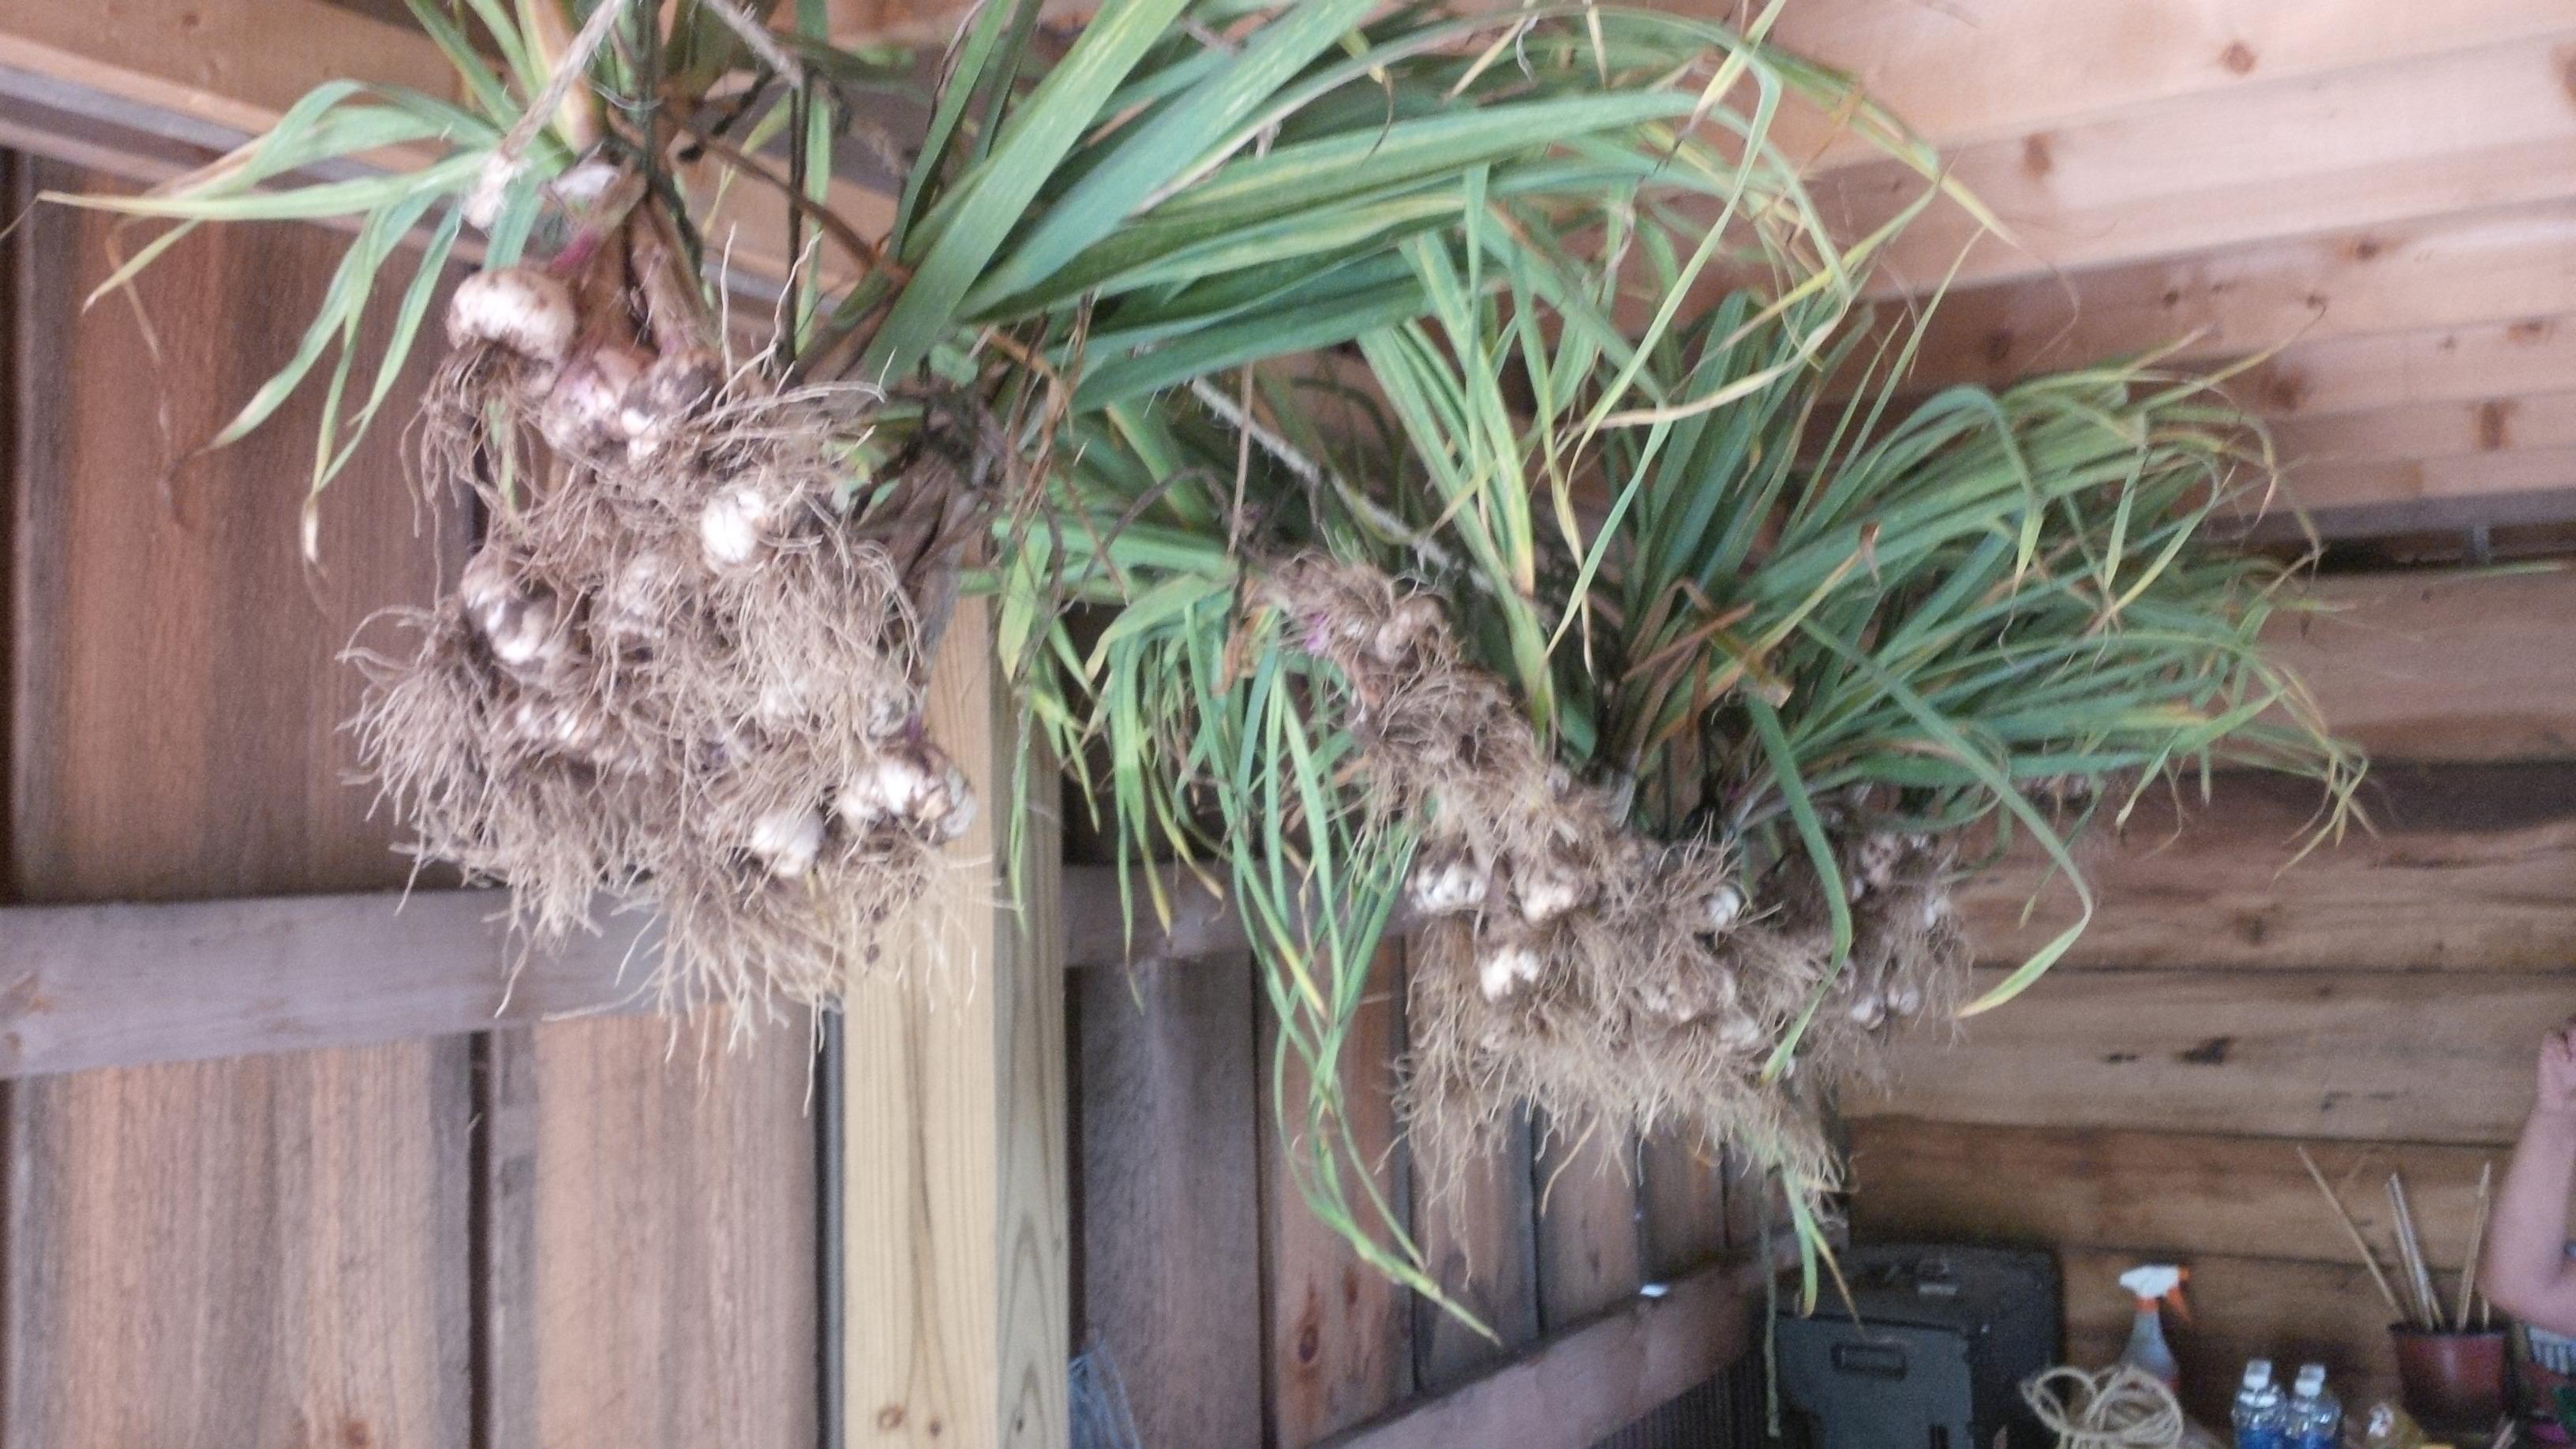 GARLIC! Growing, Harvesting And Storing